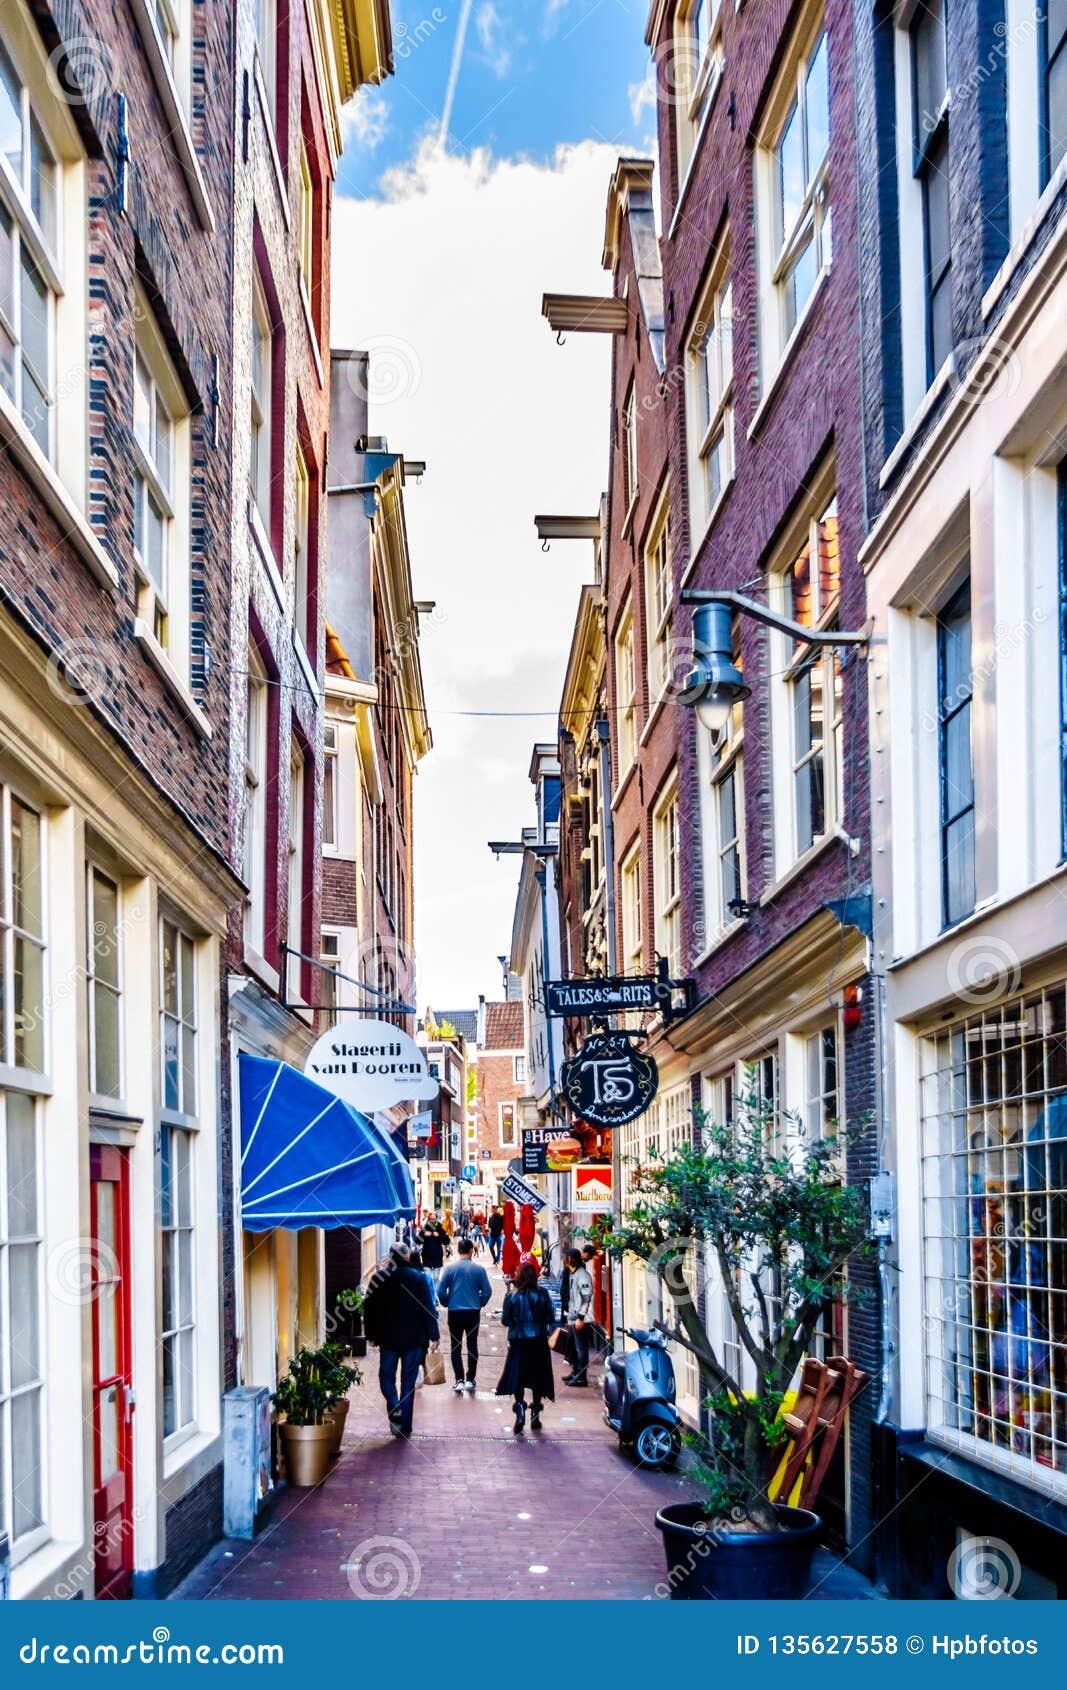 Smalle stegen en het winkelen straten in Amsterdam inHolland